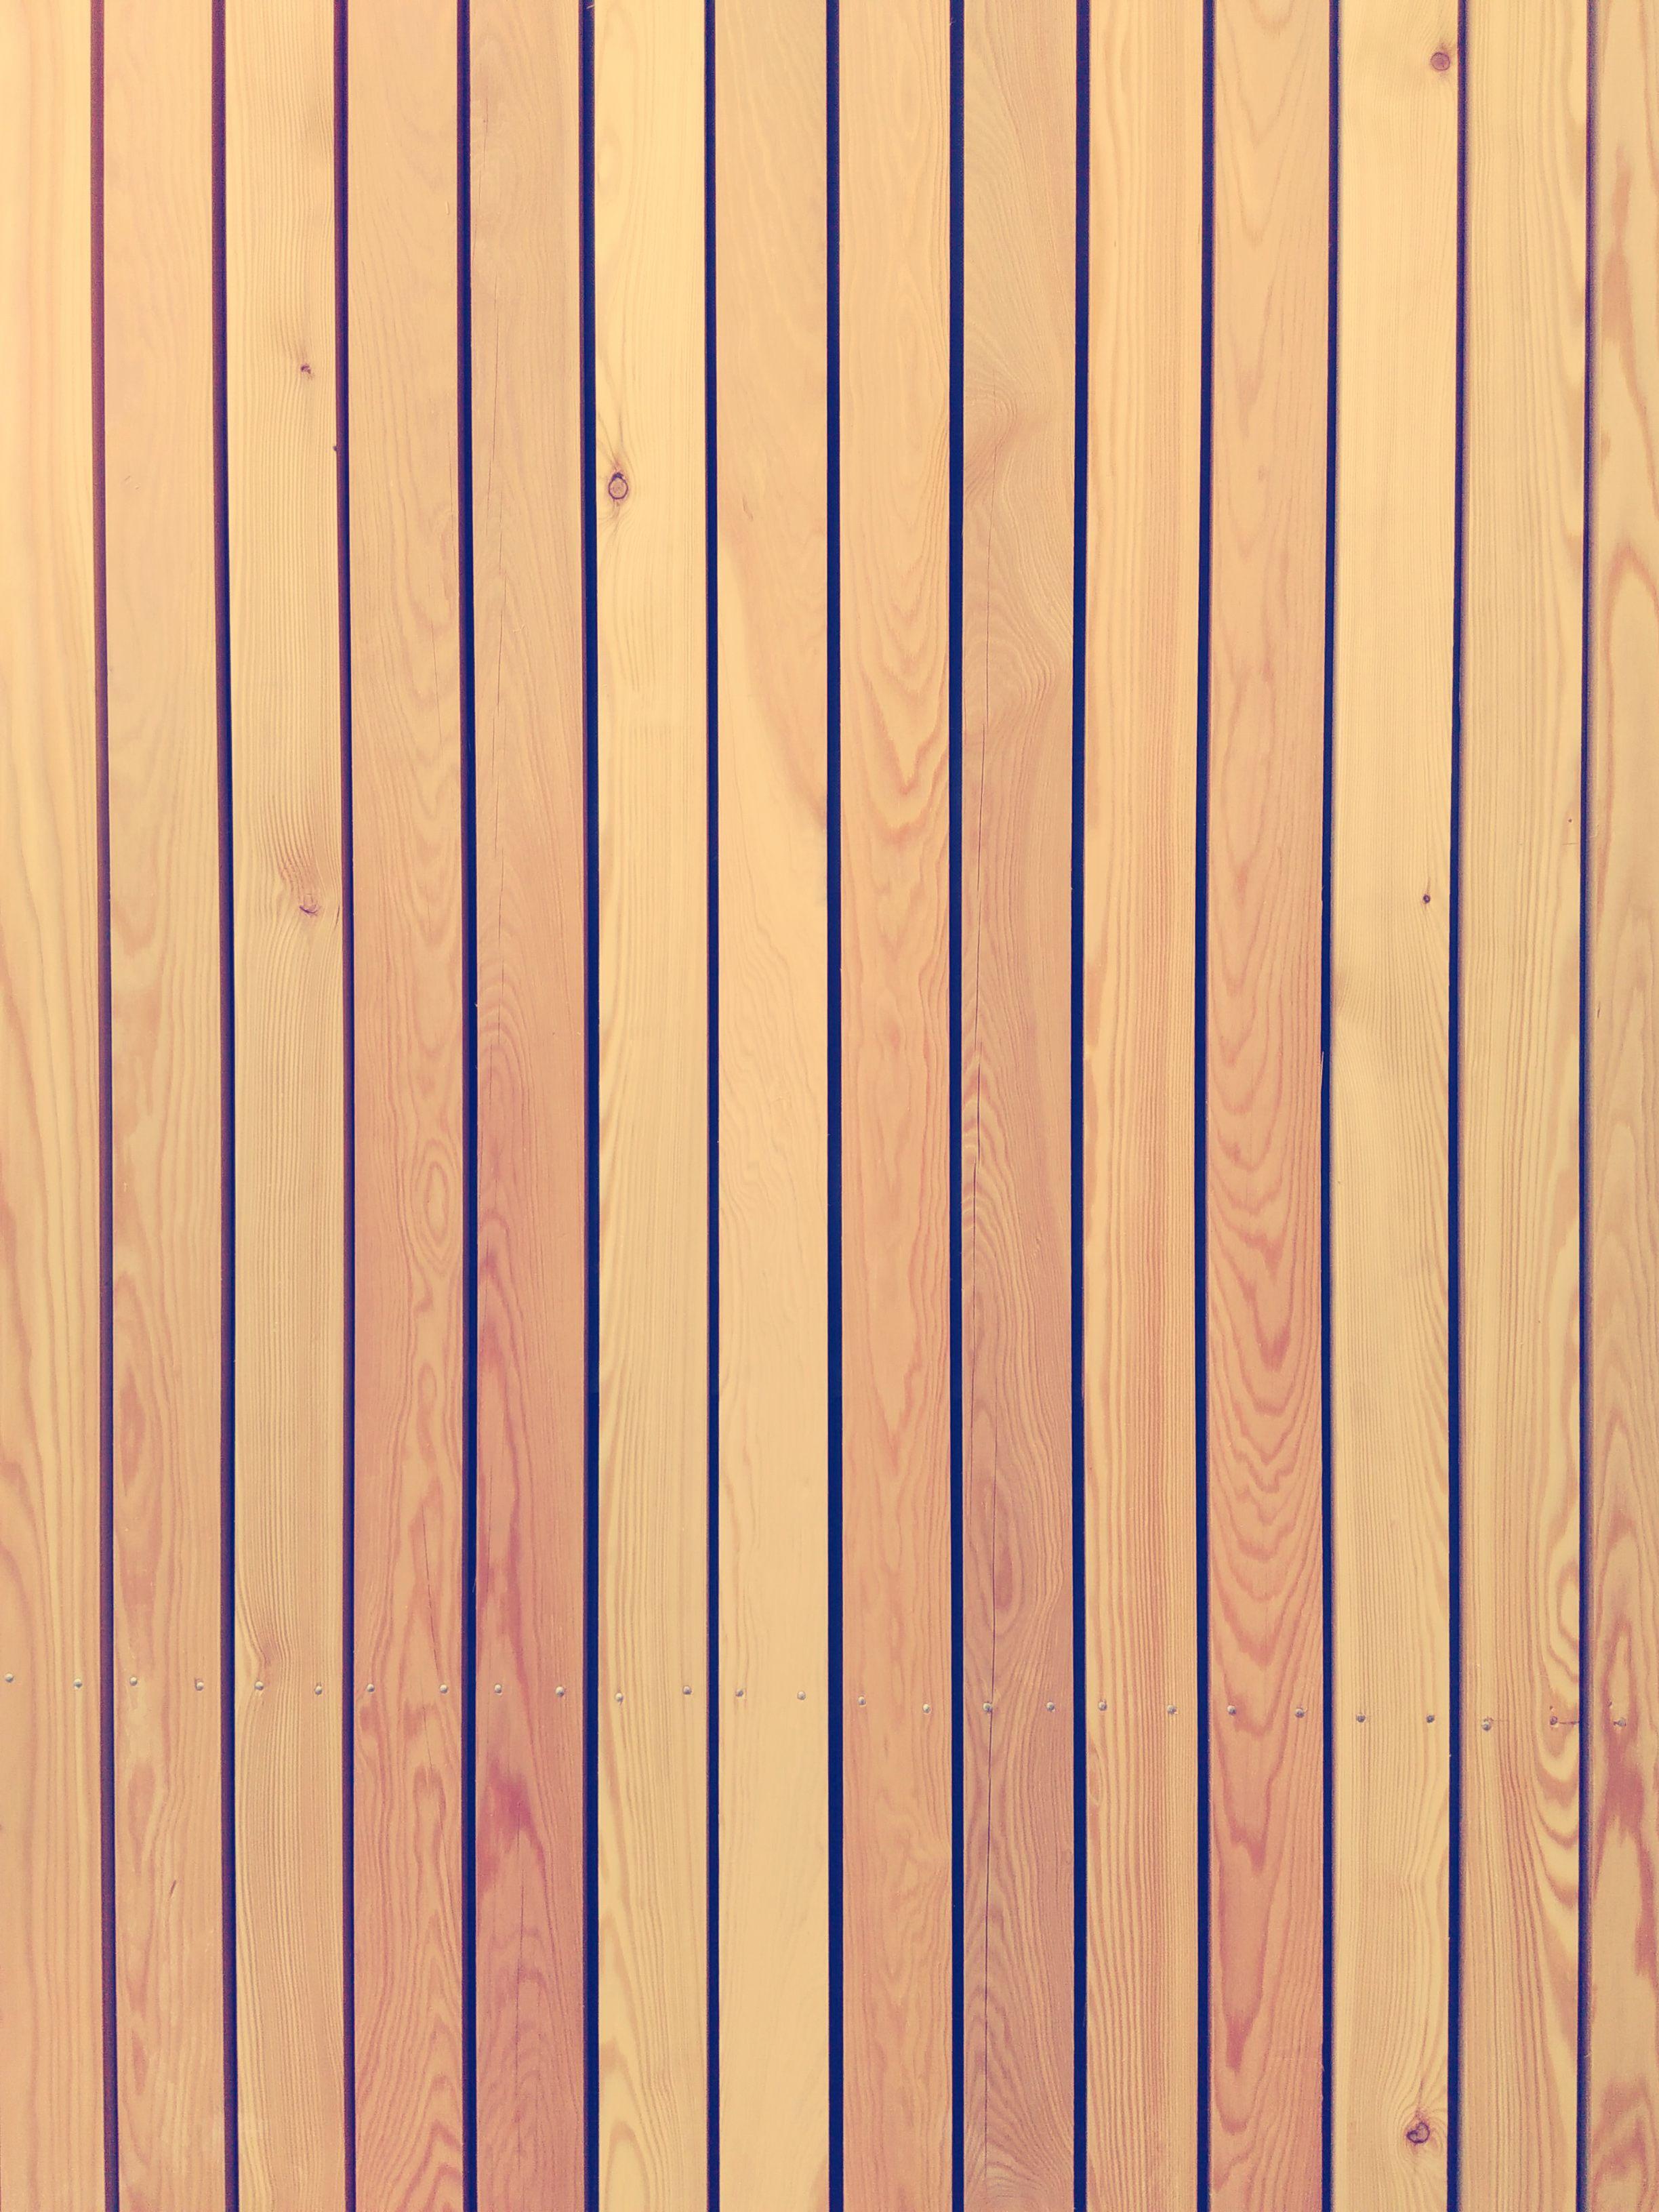 Extension A Bardage Bois Meleze Ajoure Barbara Vidal Architecte Texture Architecture Wood